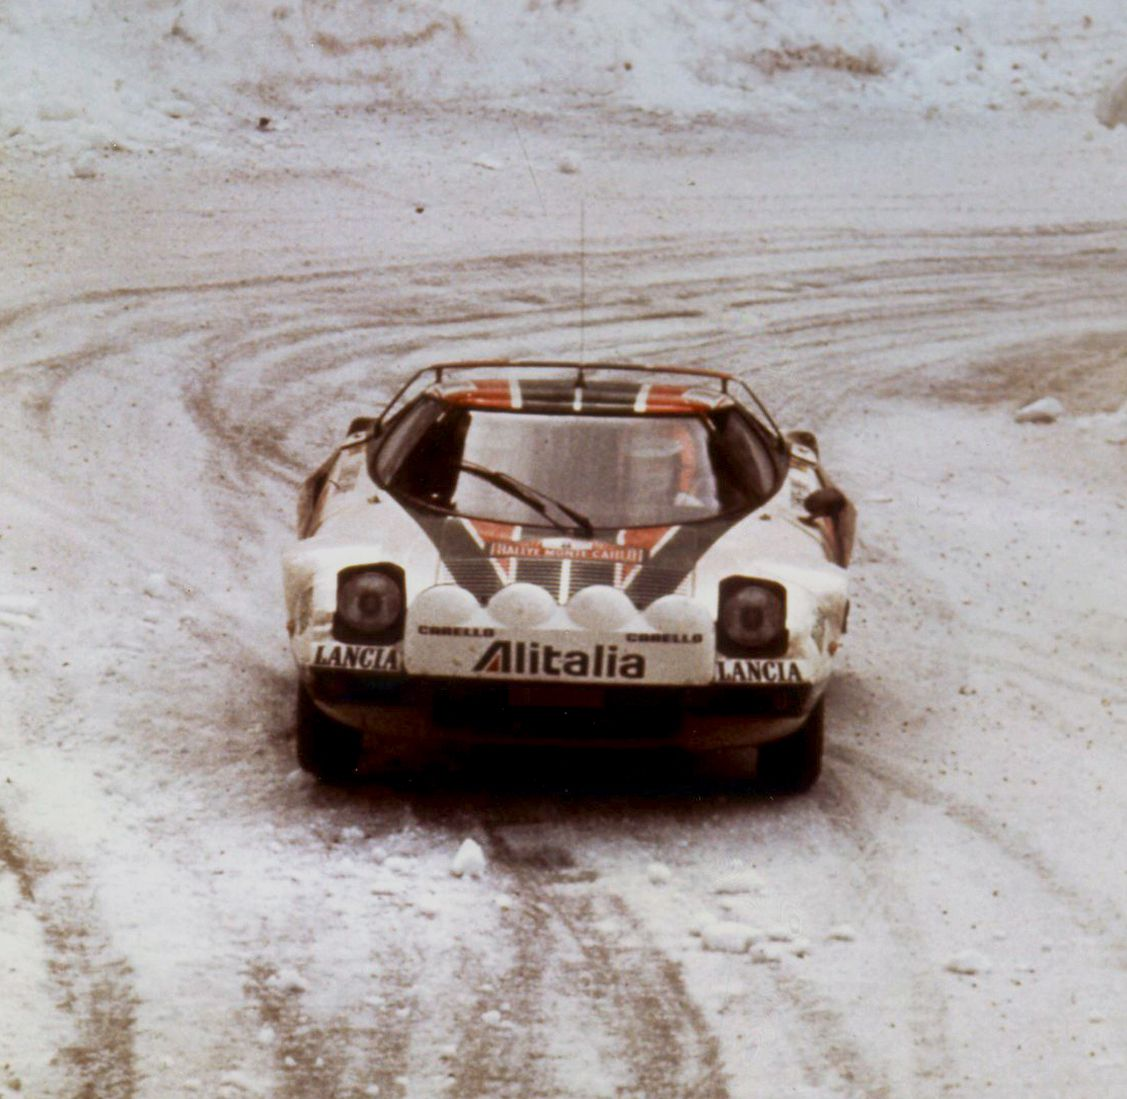 #Lancia #Stratos and Alitalia proud sponsor. This was the Monte-Carlo Rally, 1977